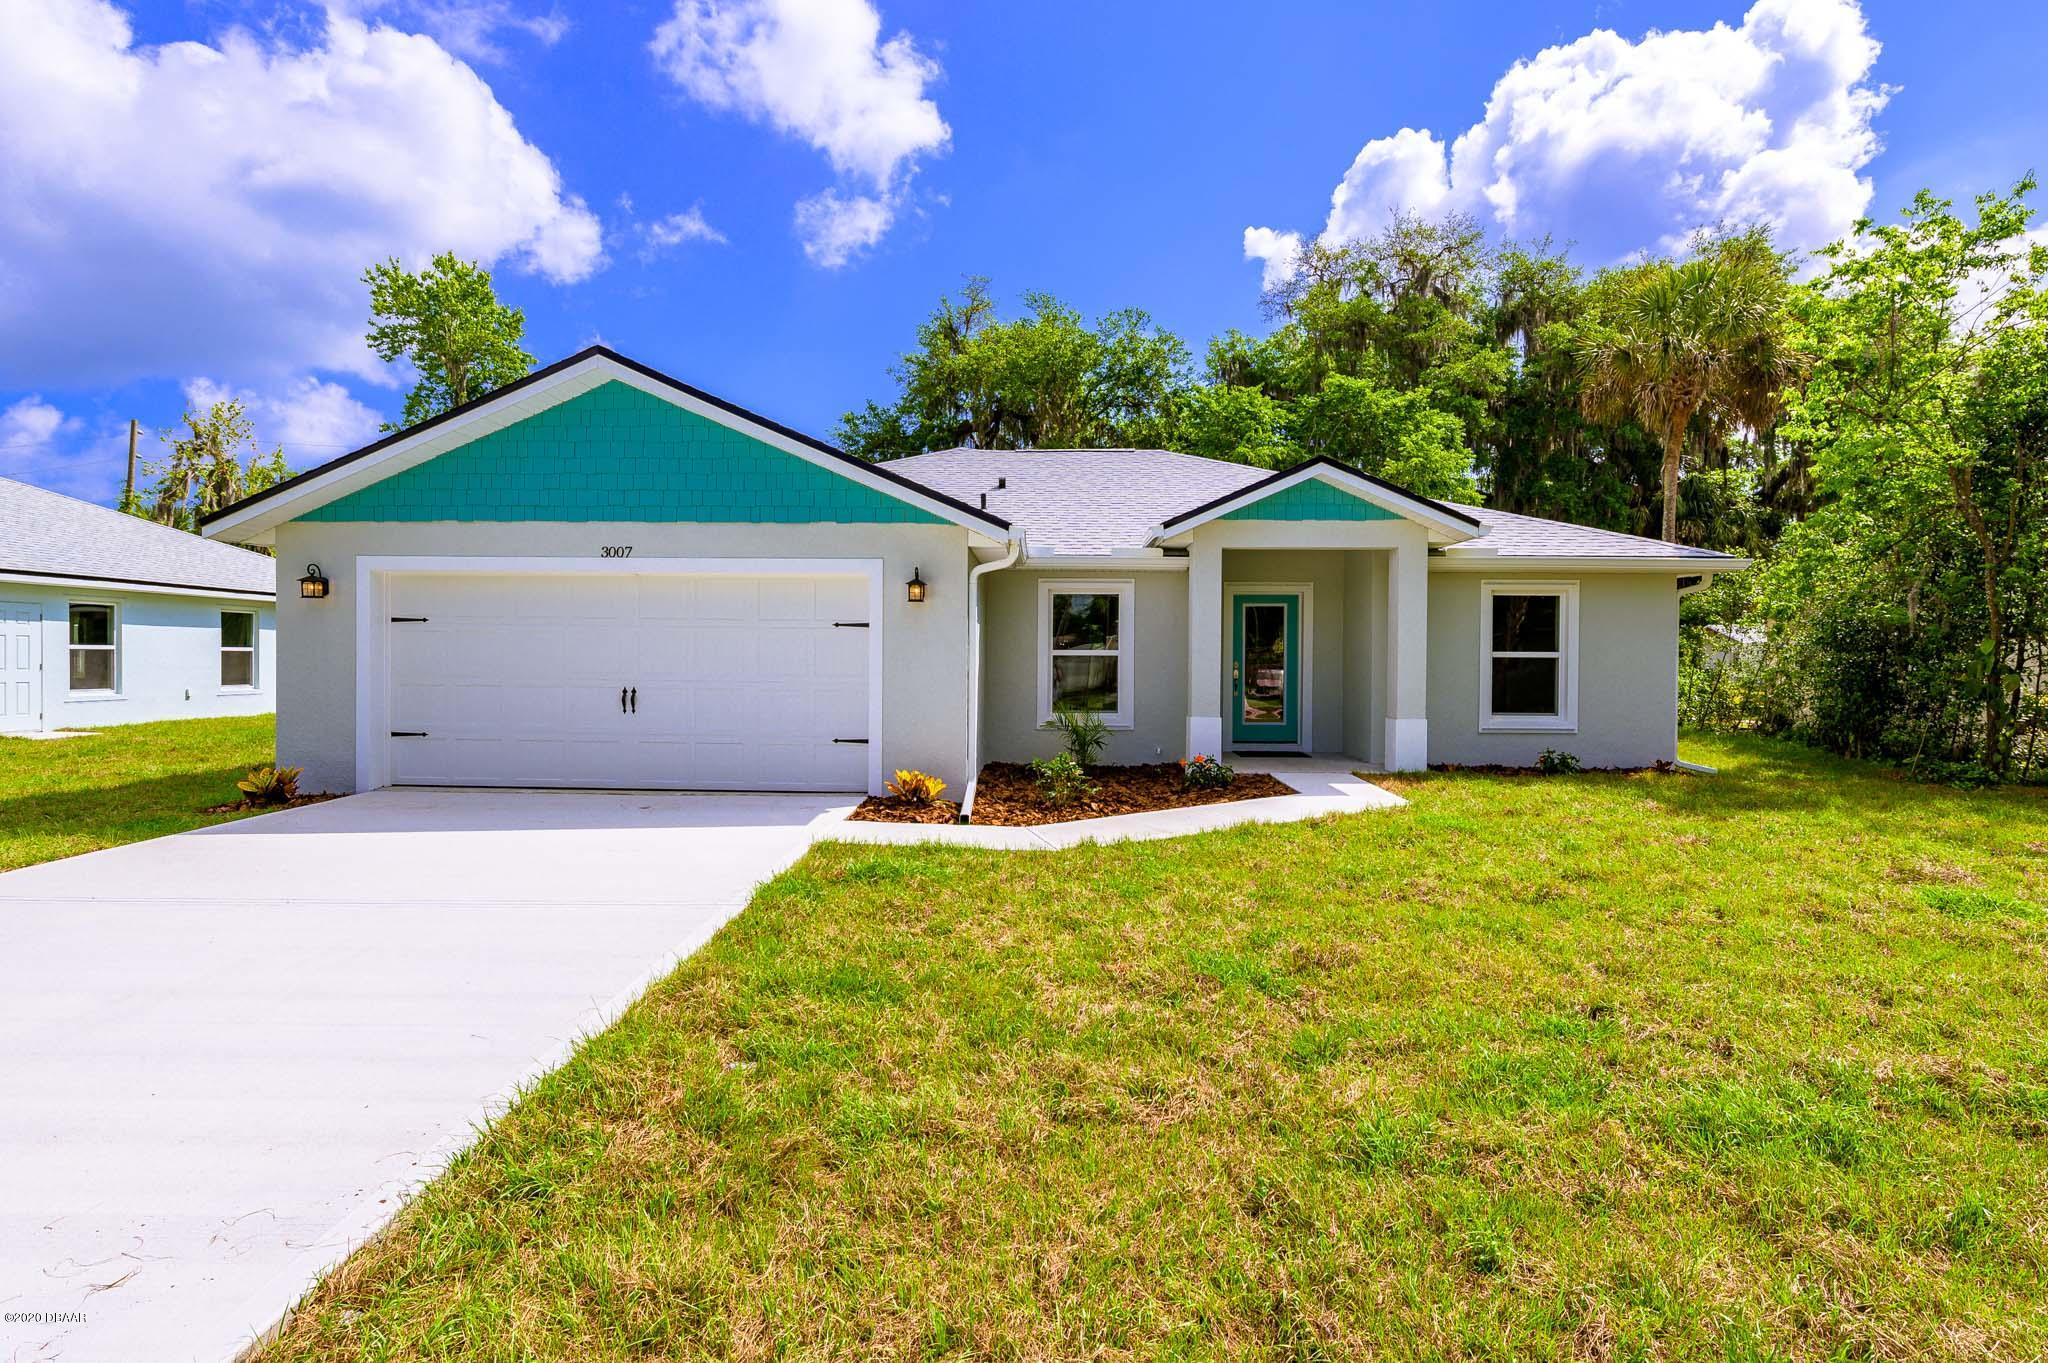 Photo of 3007 Mango Tree Drive, Edgewater, FL 32141